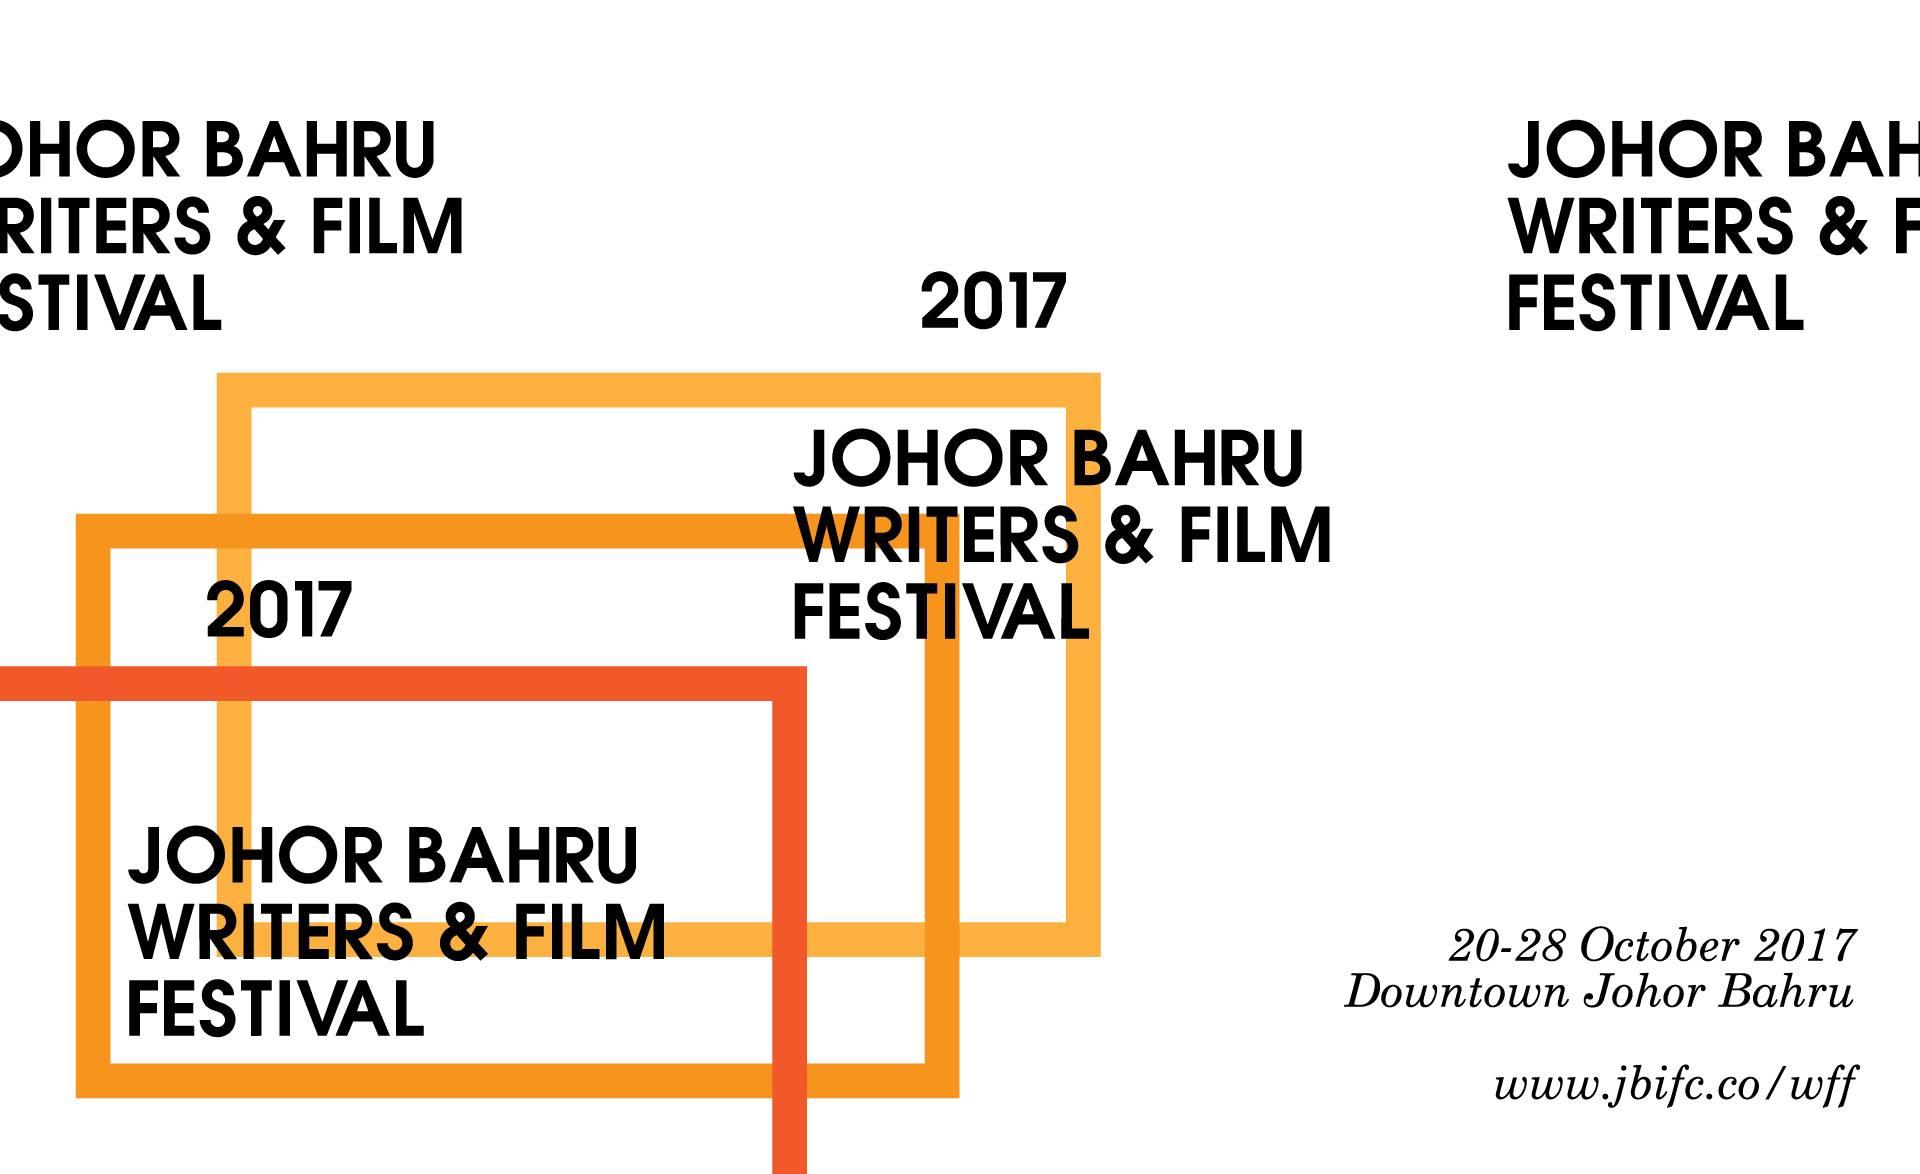 Johor Bahru Writers and Film Festival 2017| 20-28 October 2017